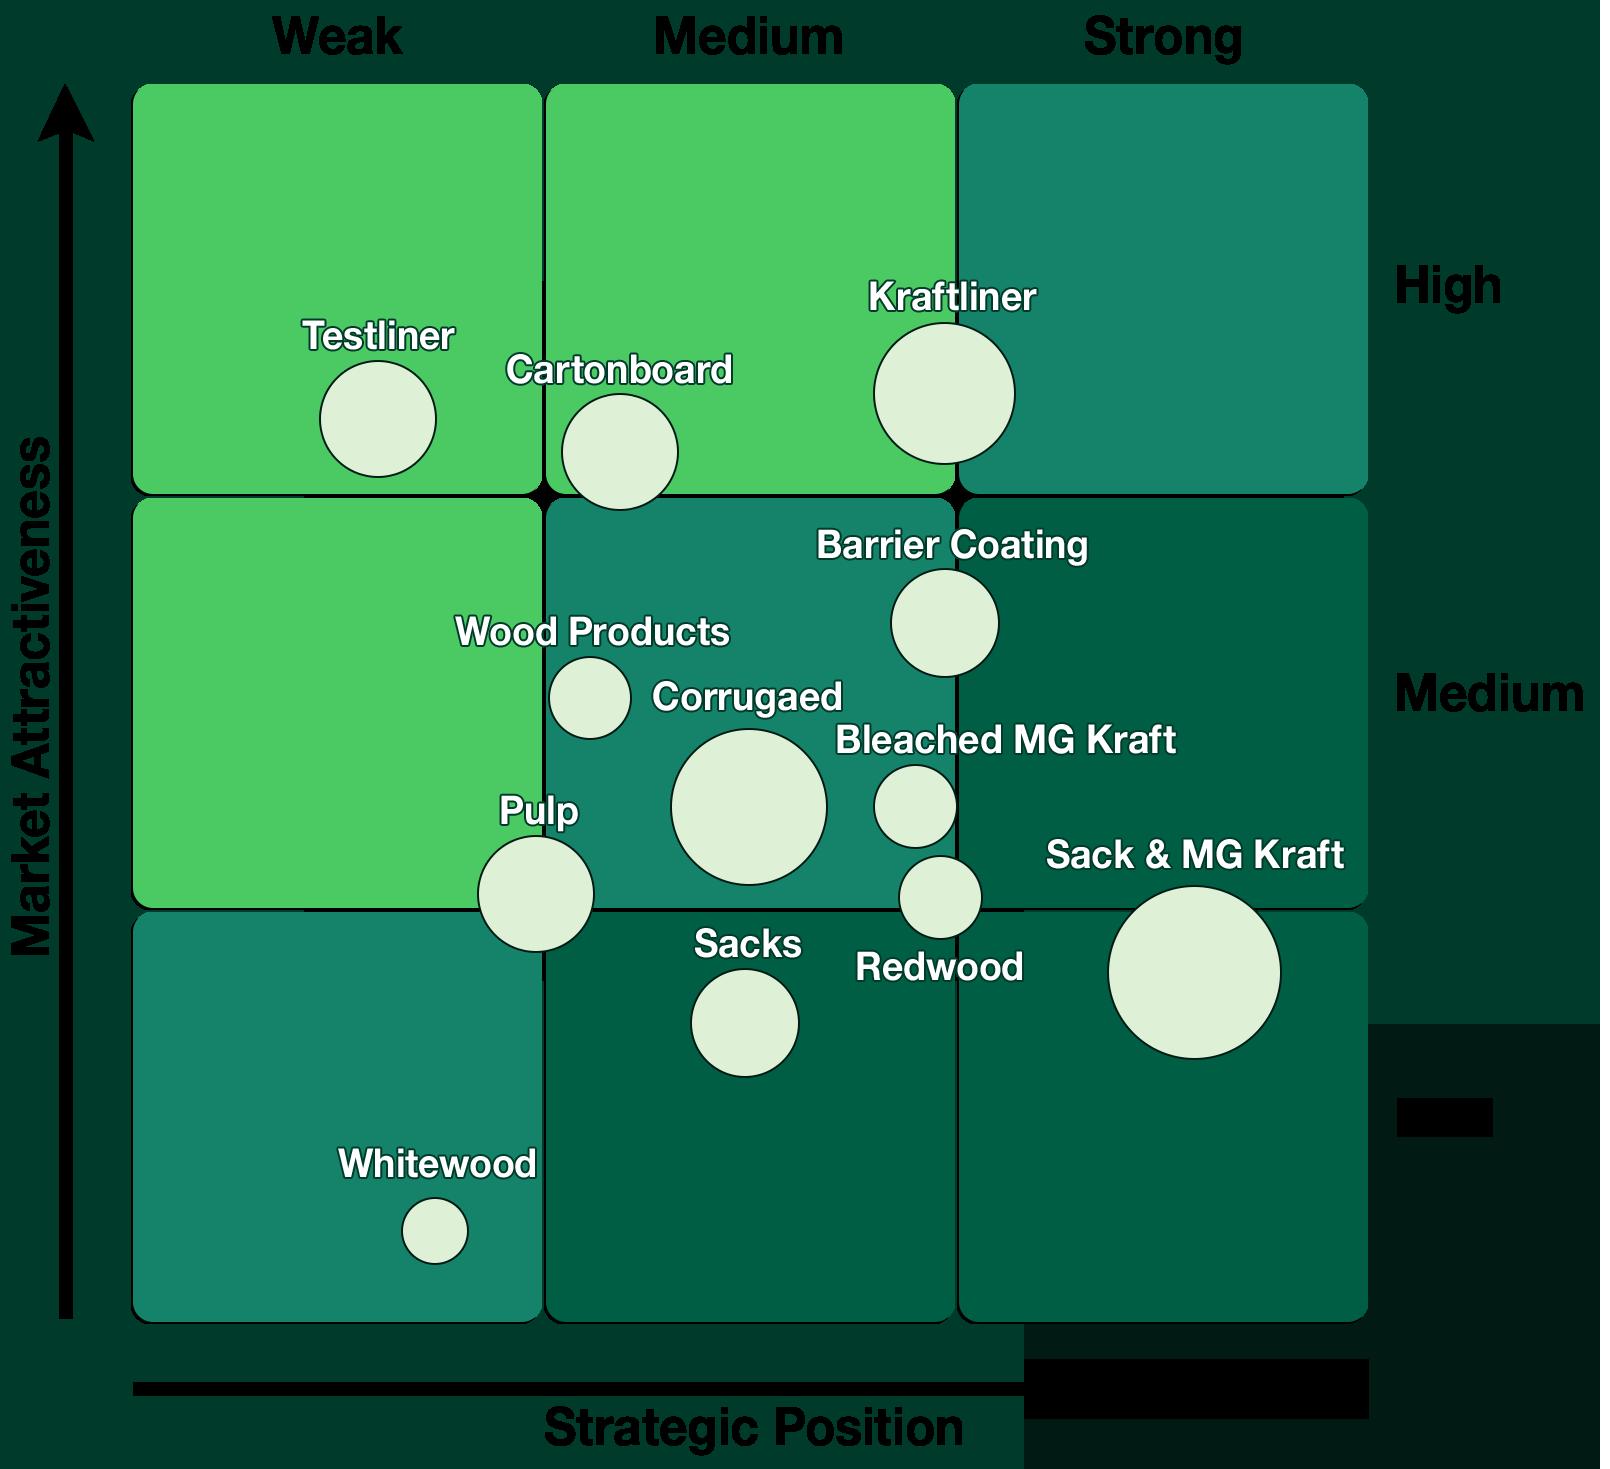 Strategic Position vs. Market Attractiveness